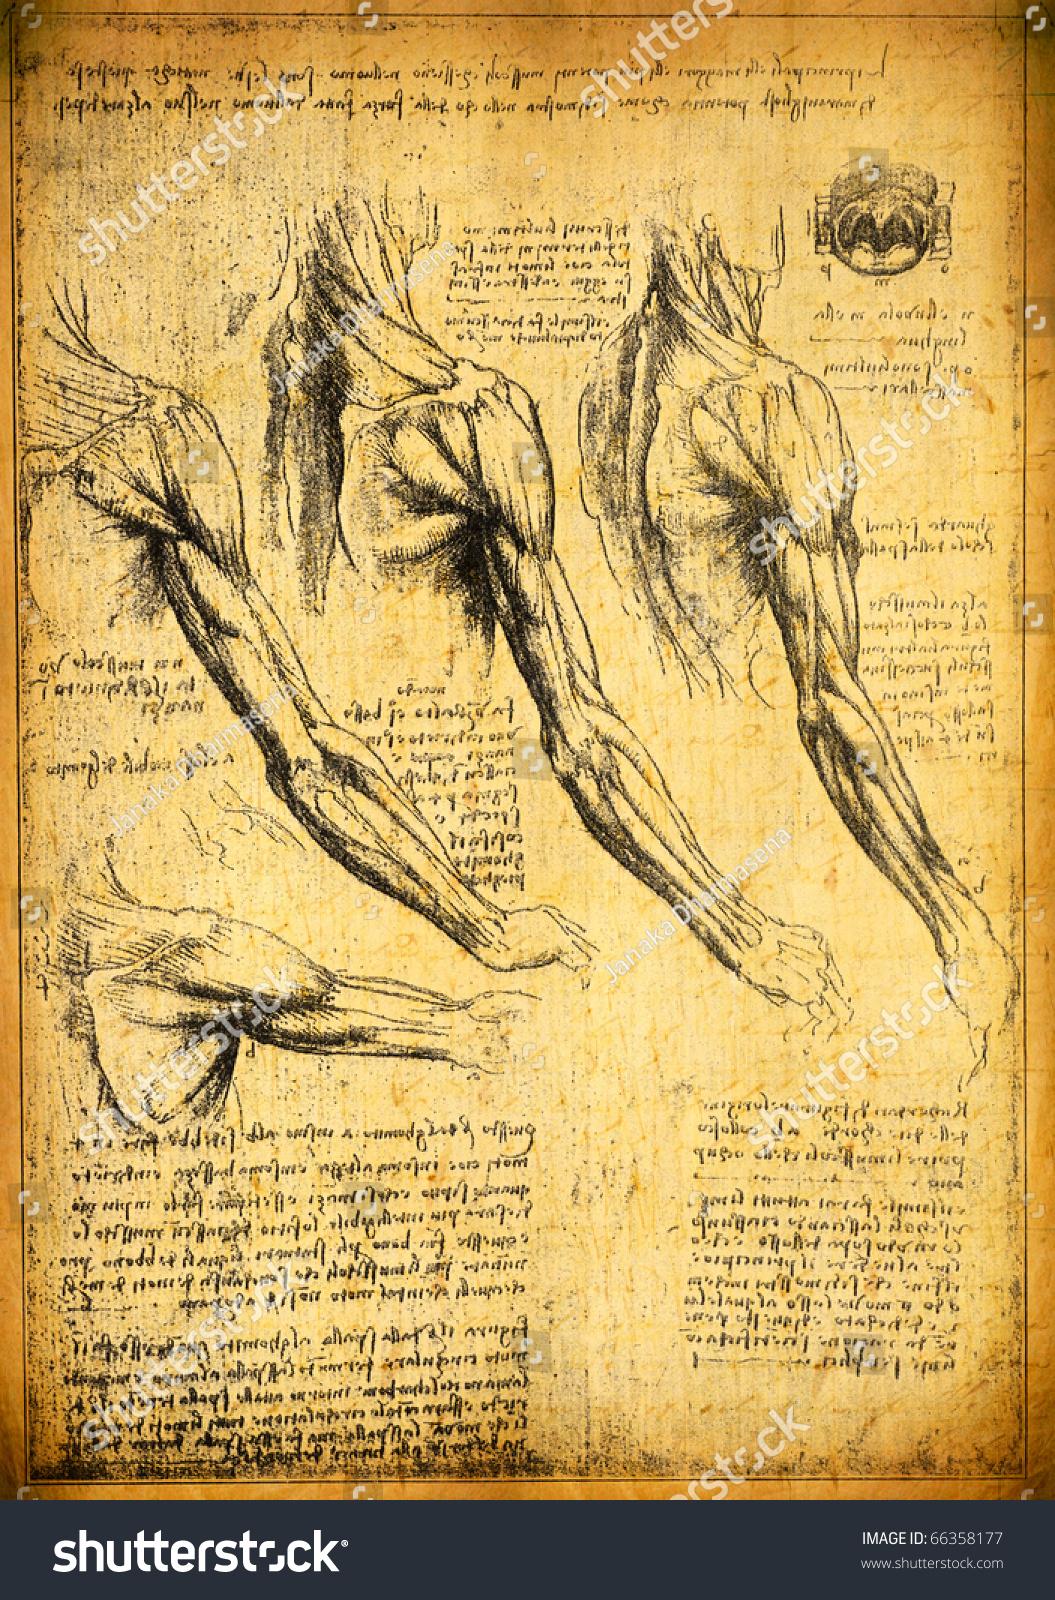 Anatomy Art By Leonardo Da Vinci Stock Illustration 66358177 ...